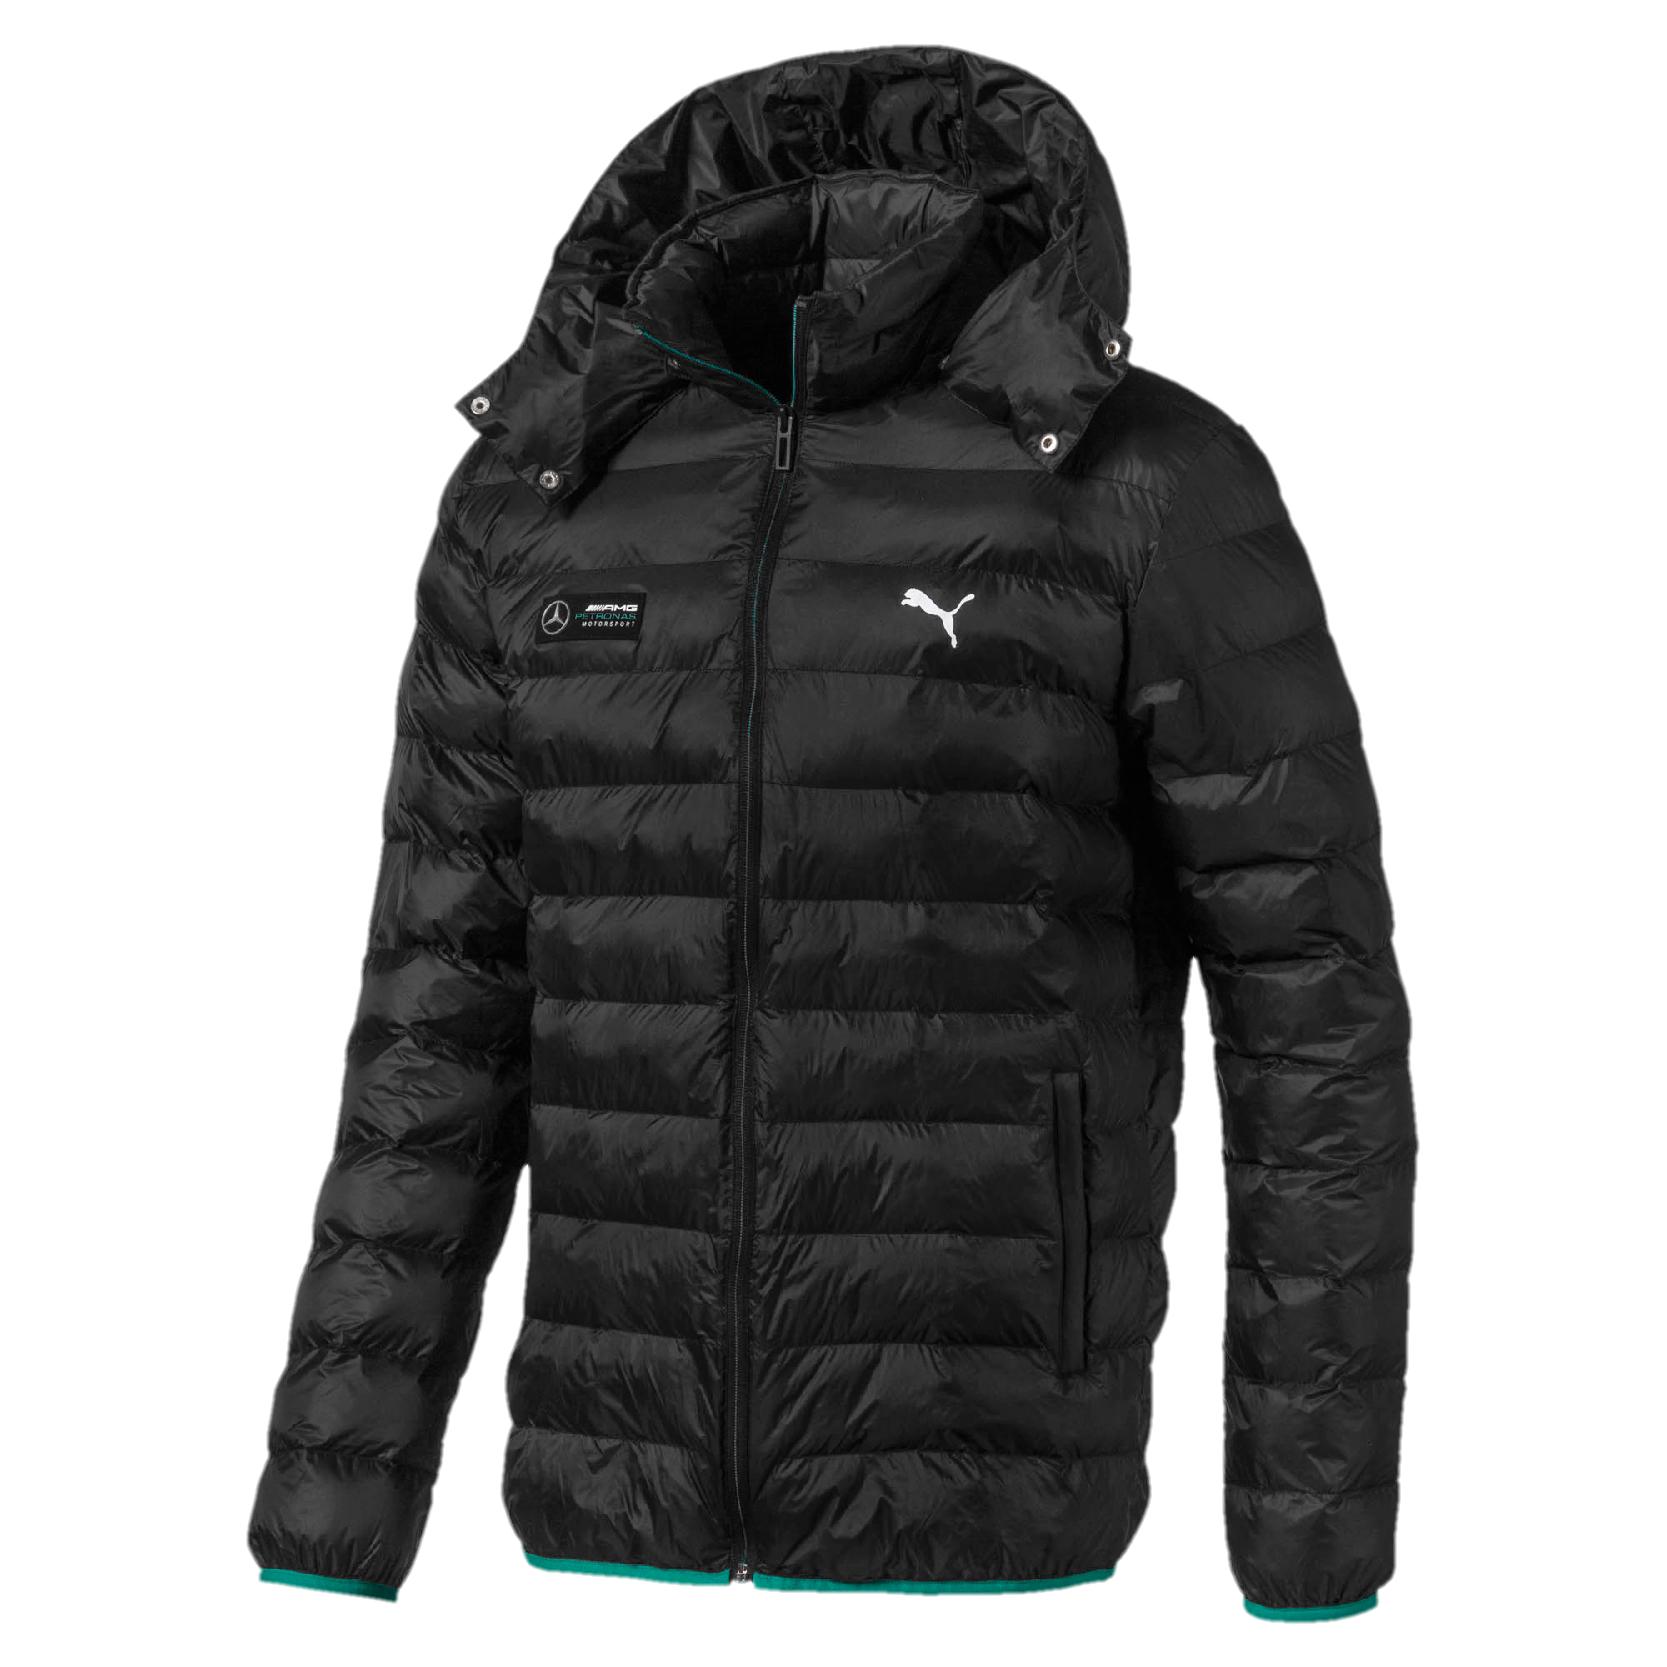 Куртка PUMA Mapm Eco Packliite Jacket цена